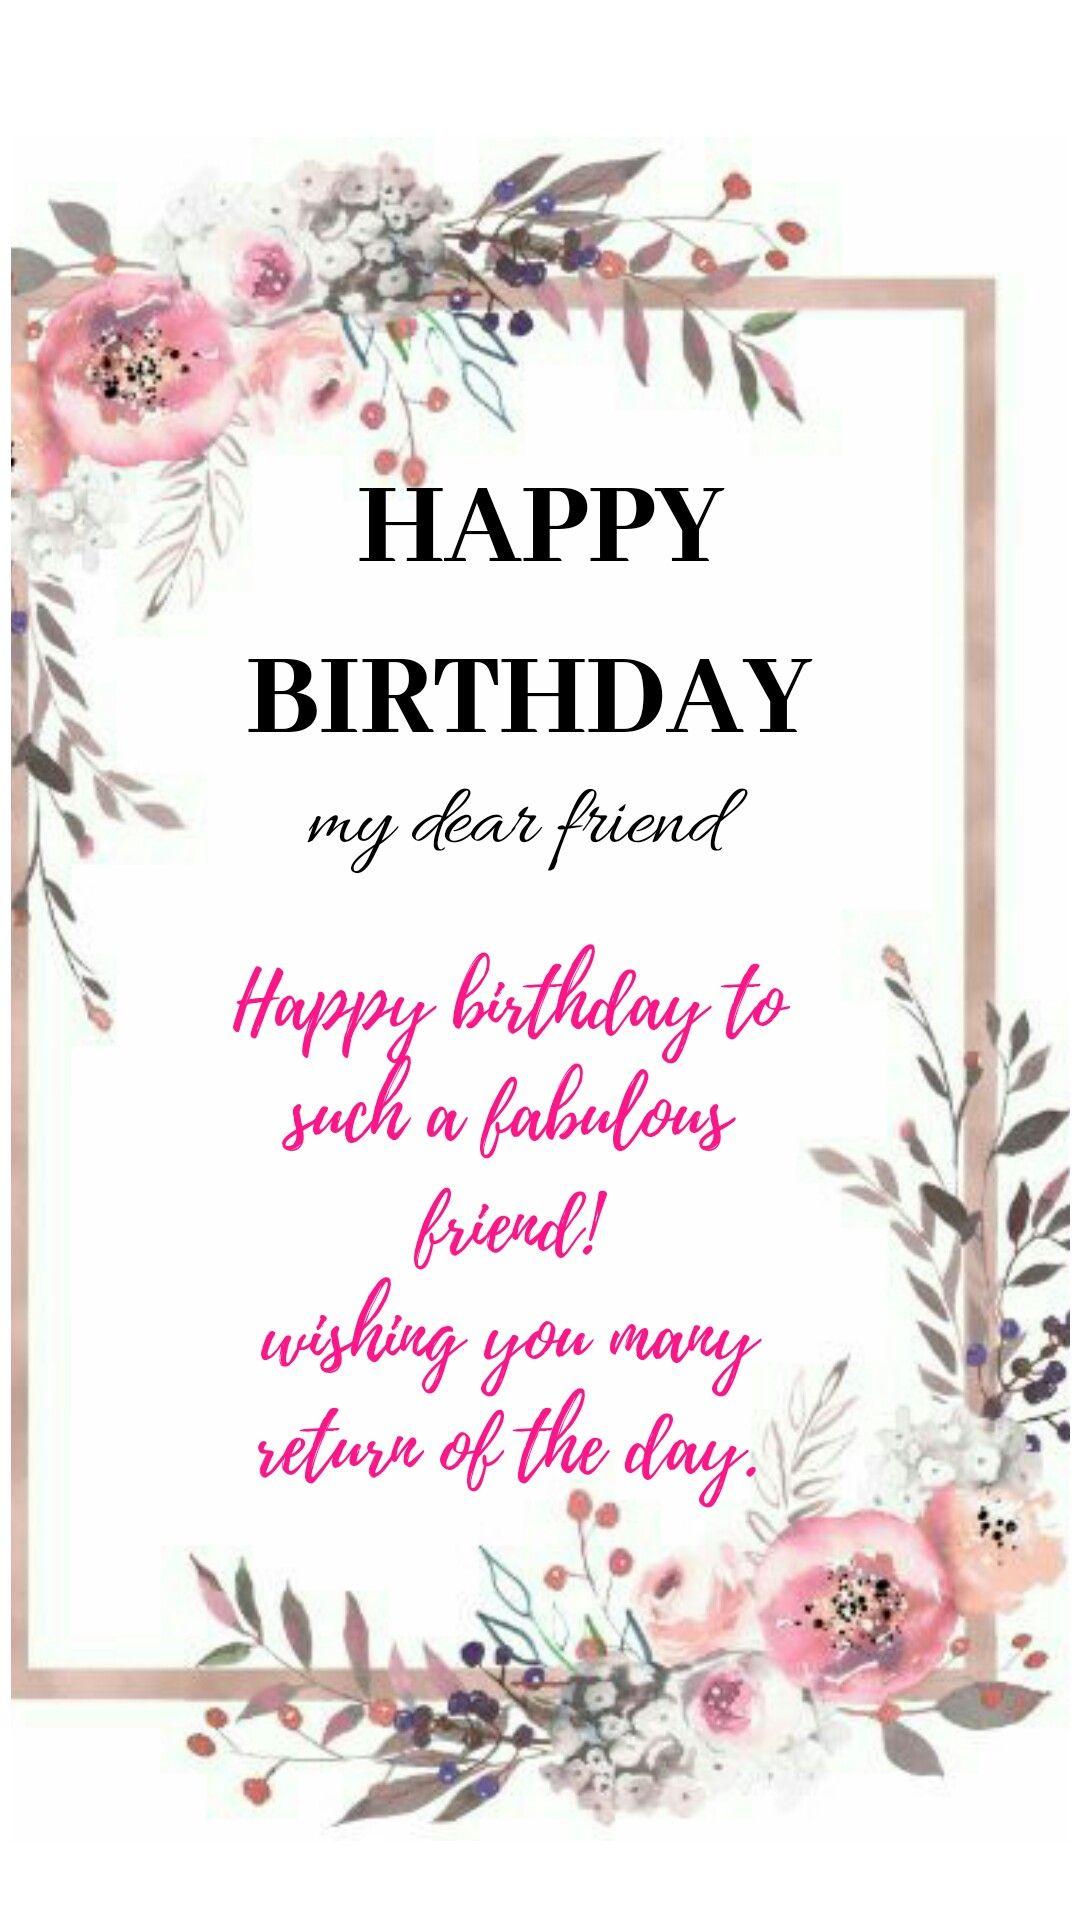 Happy Birthday Happy Birthday Dear Friend Happy Birthday Greetings Friends Happy Birthday Wishes Images